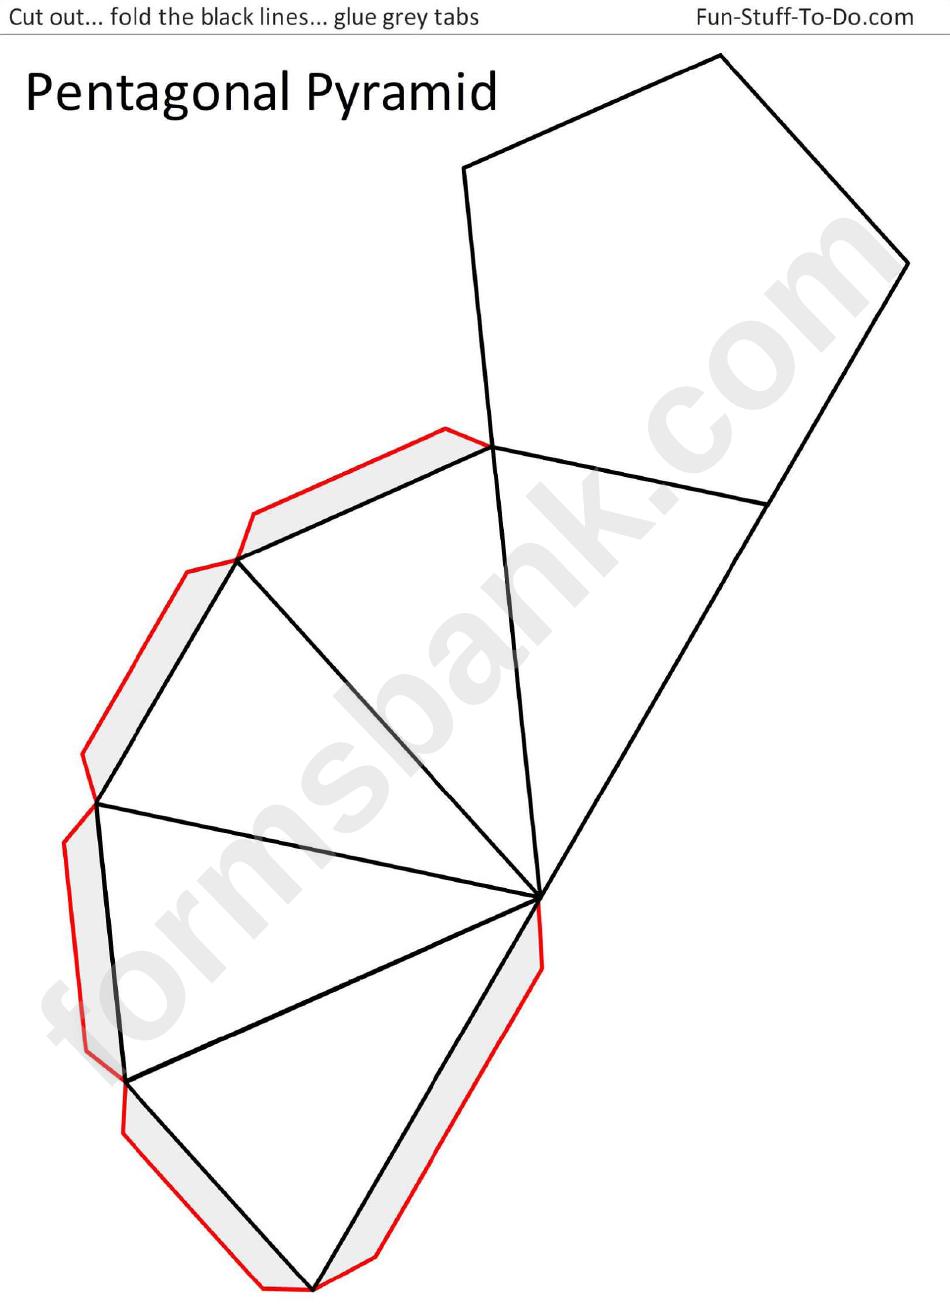 Pentagonal Pyramid Template printable pdf download